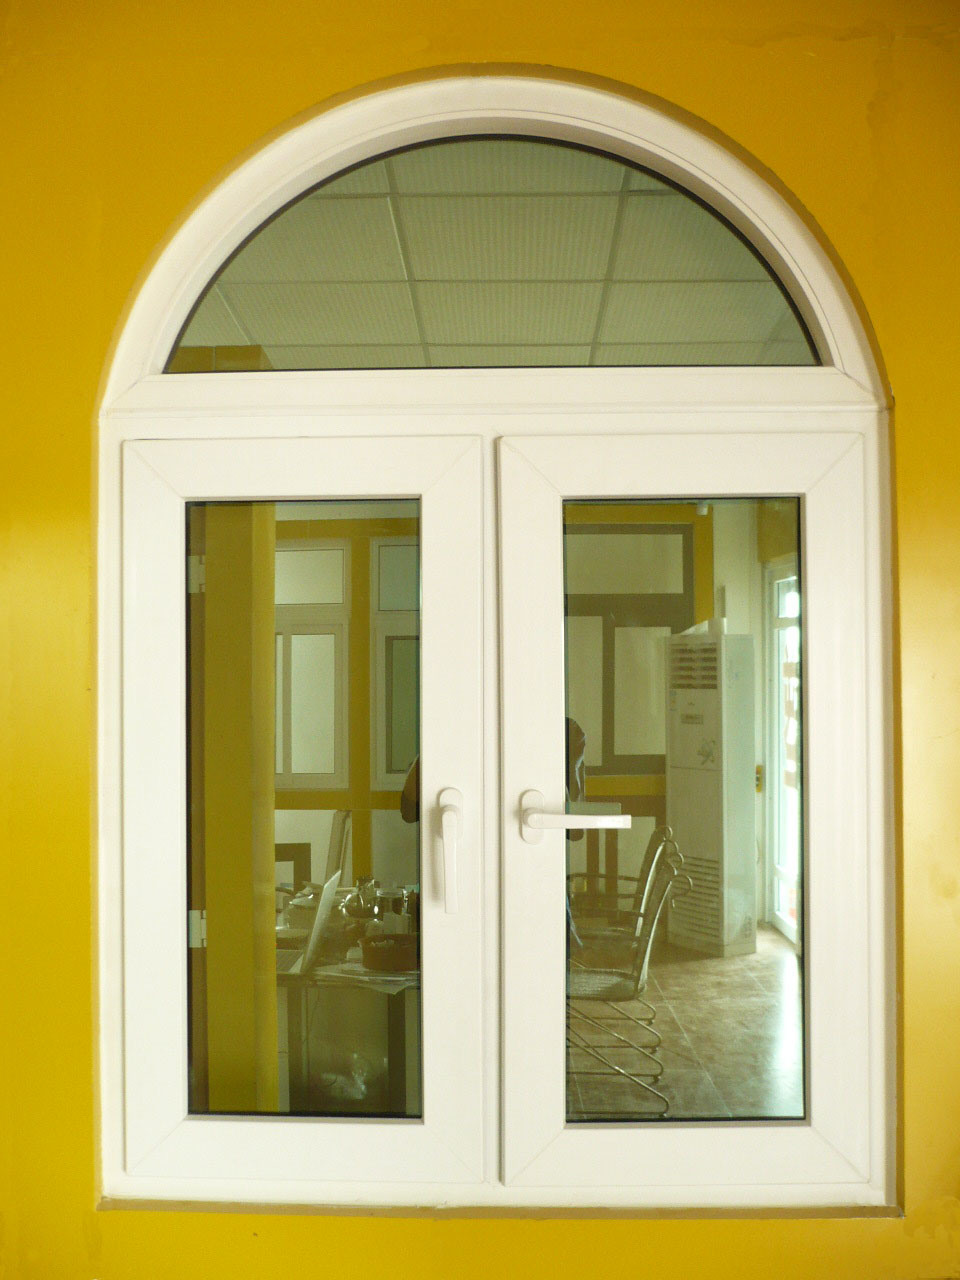 Pvc Window Product : China pvc window upvc